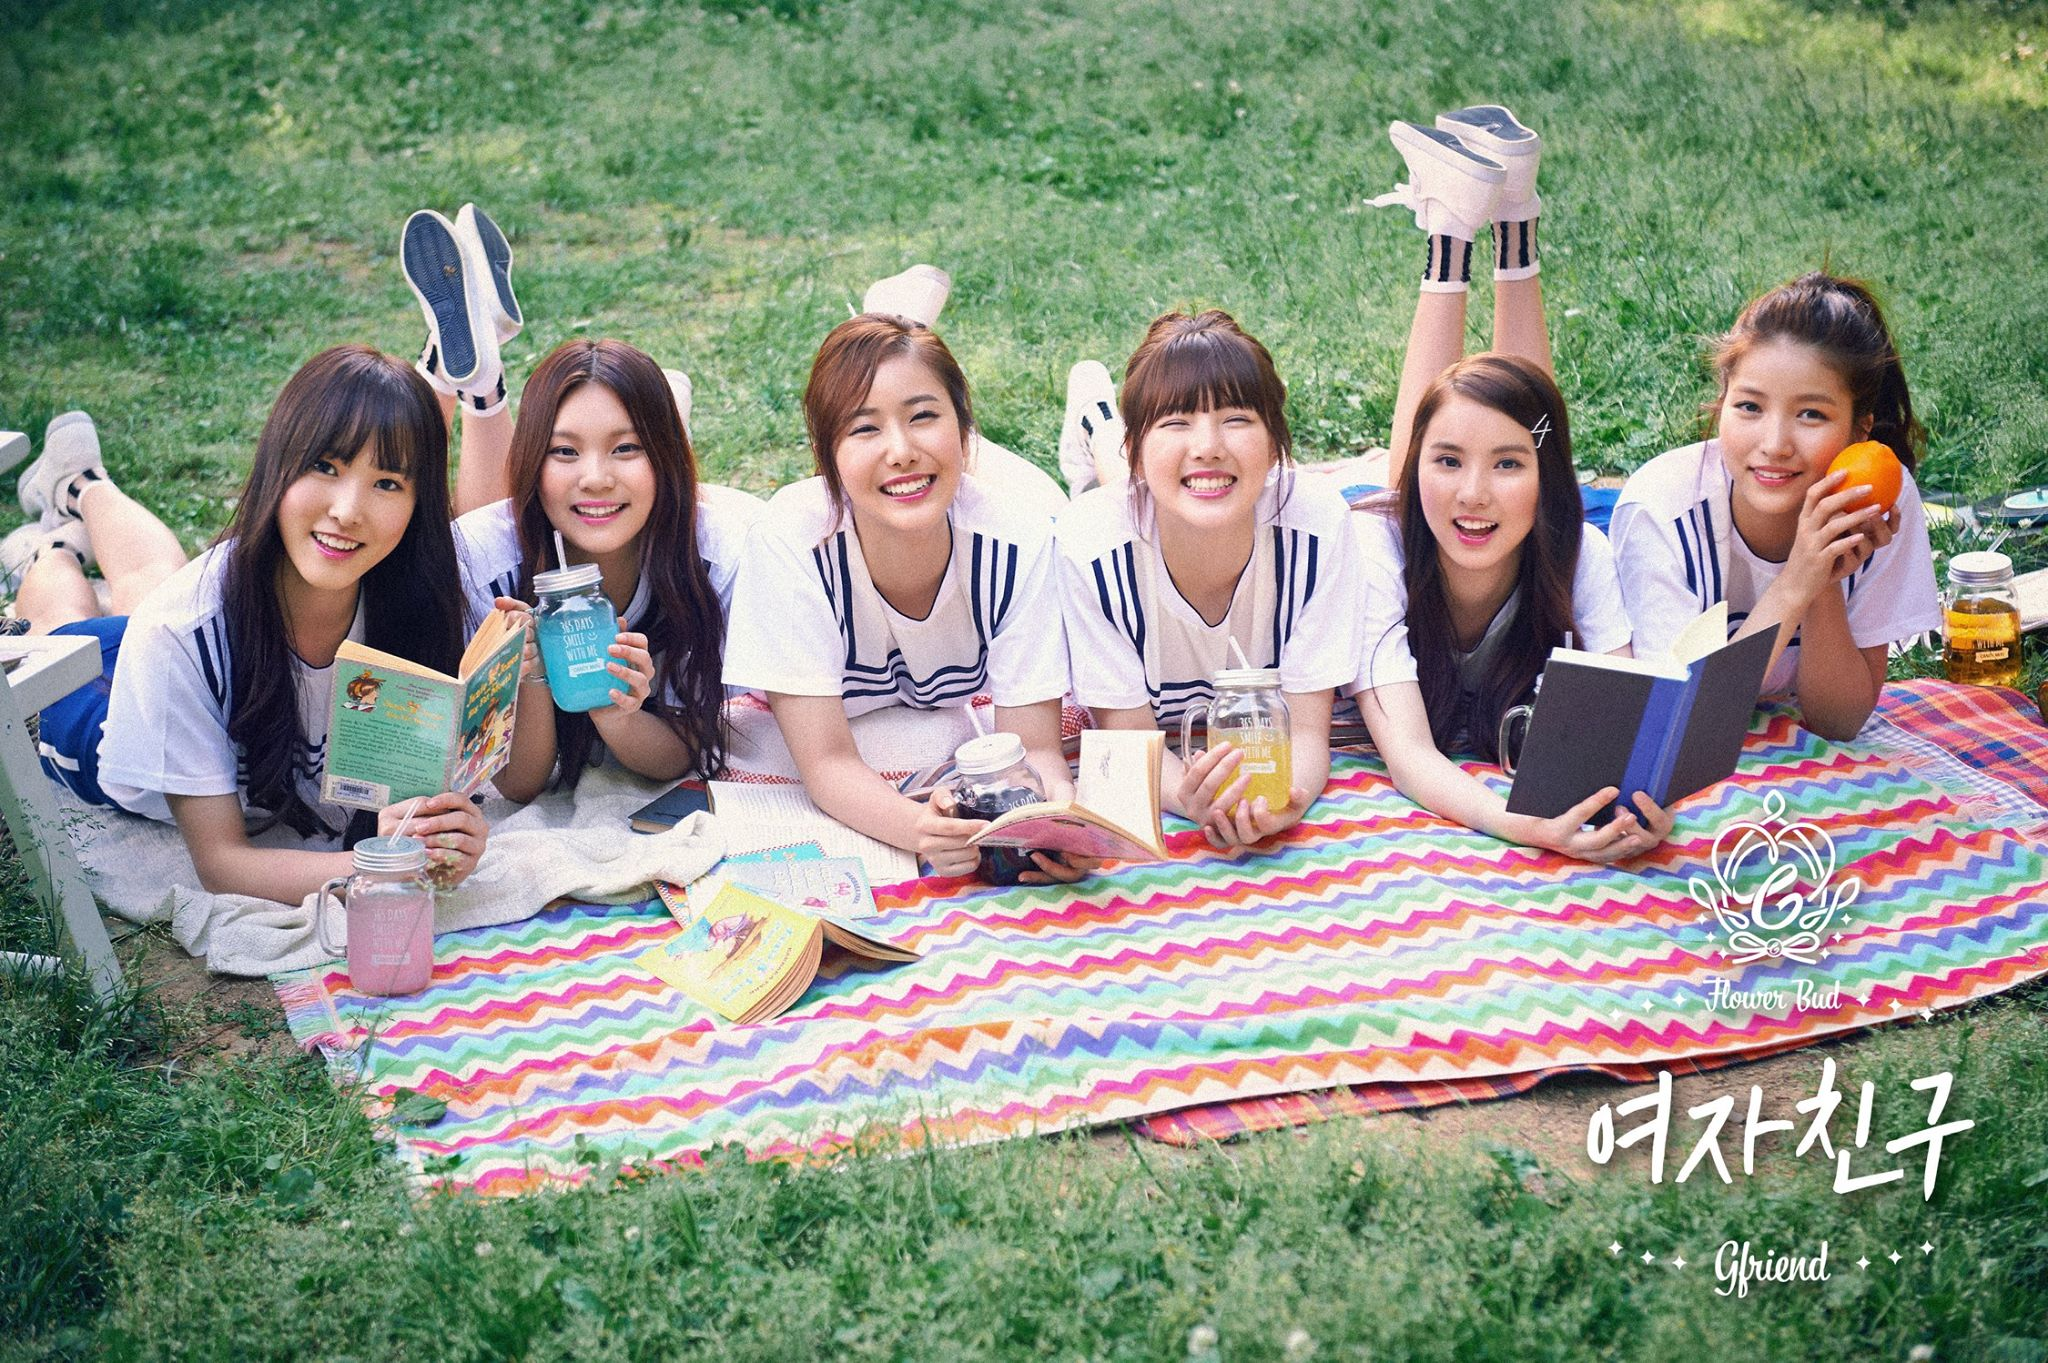 TOP 10. GFRIEND(女朋友) 第2張迷你專輯《FLOWER BUD》(2015/07/23) 專輯銷量: 8,467張